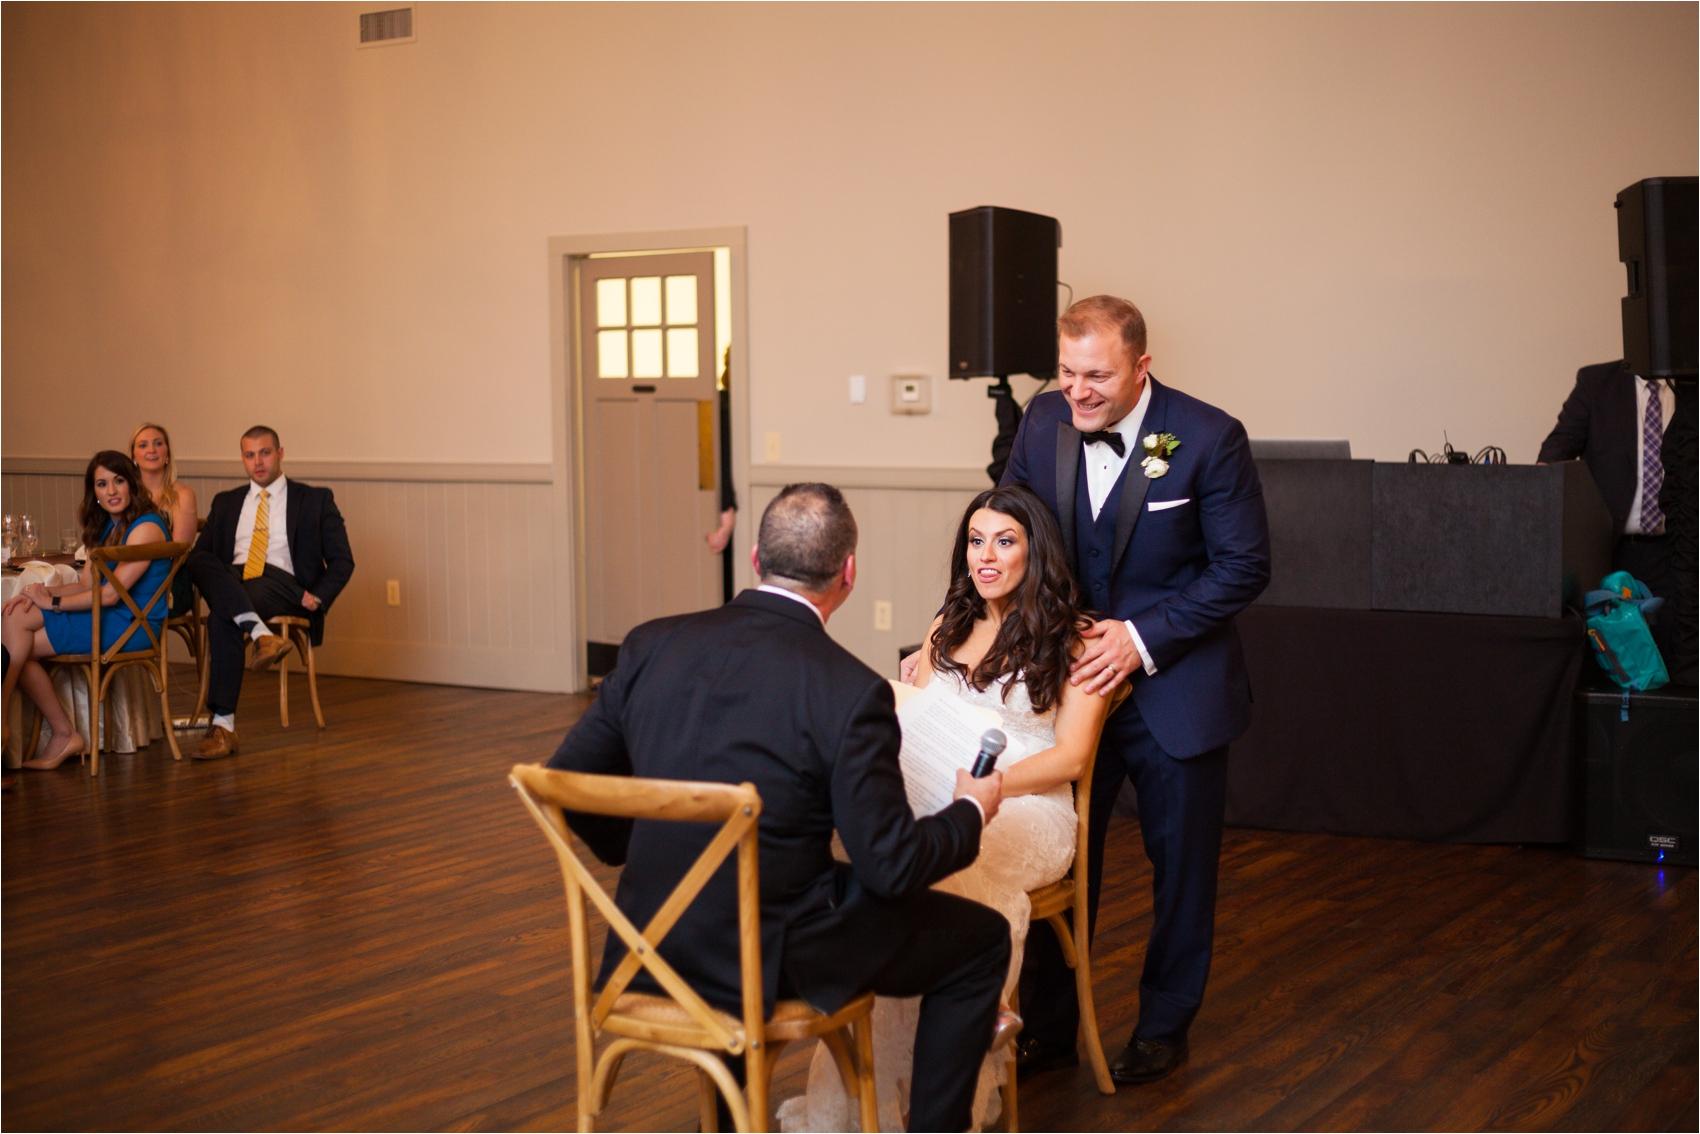 King-Family-Vineyard-Spring-Virginia-Wedding-2021.jpg